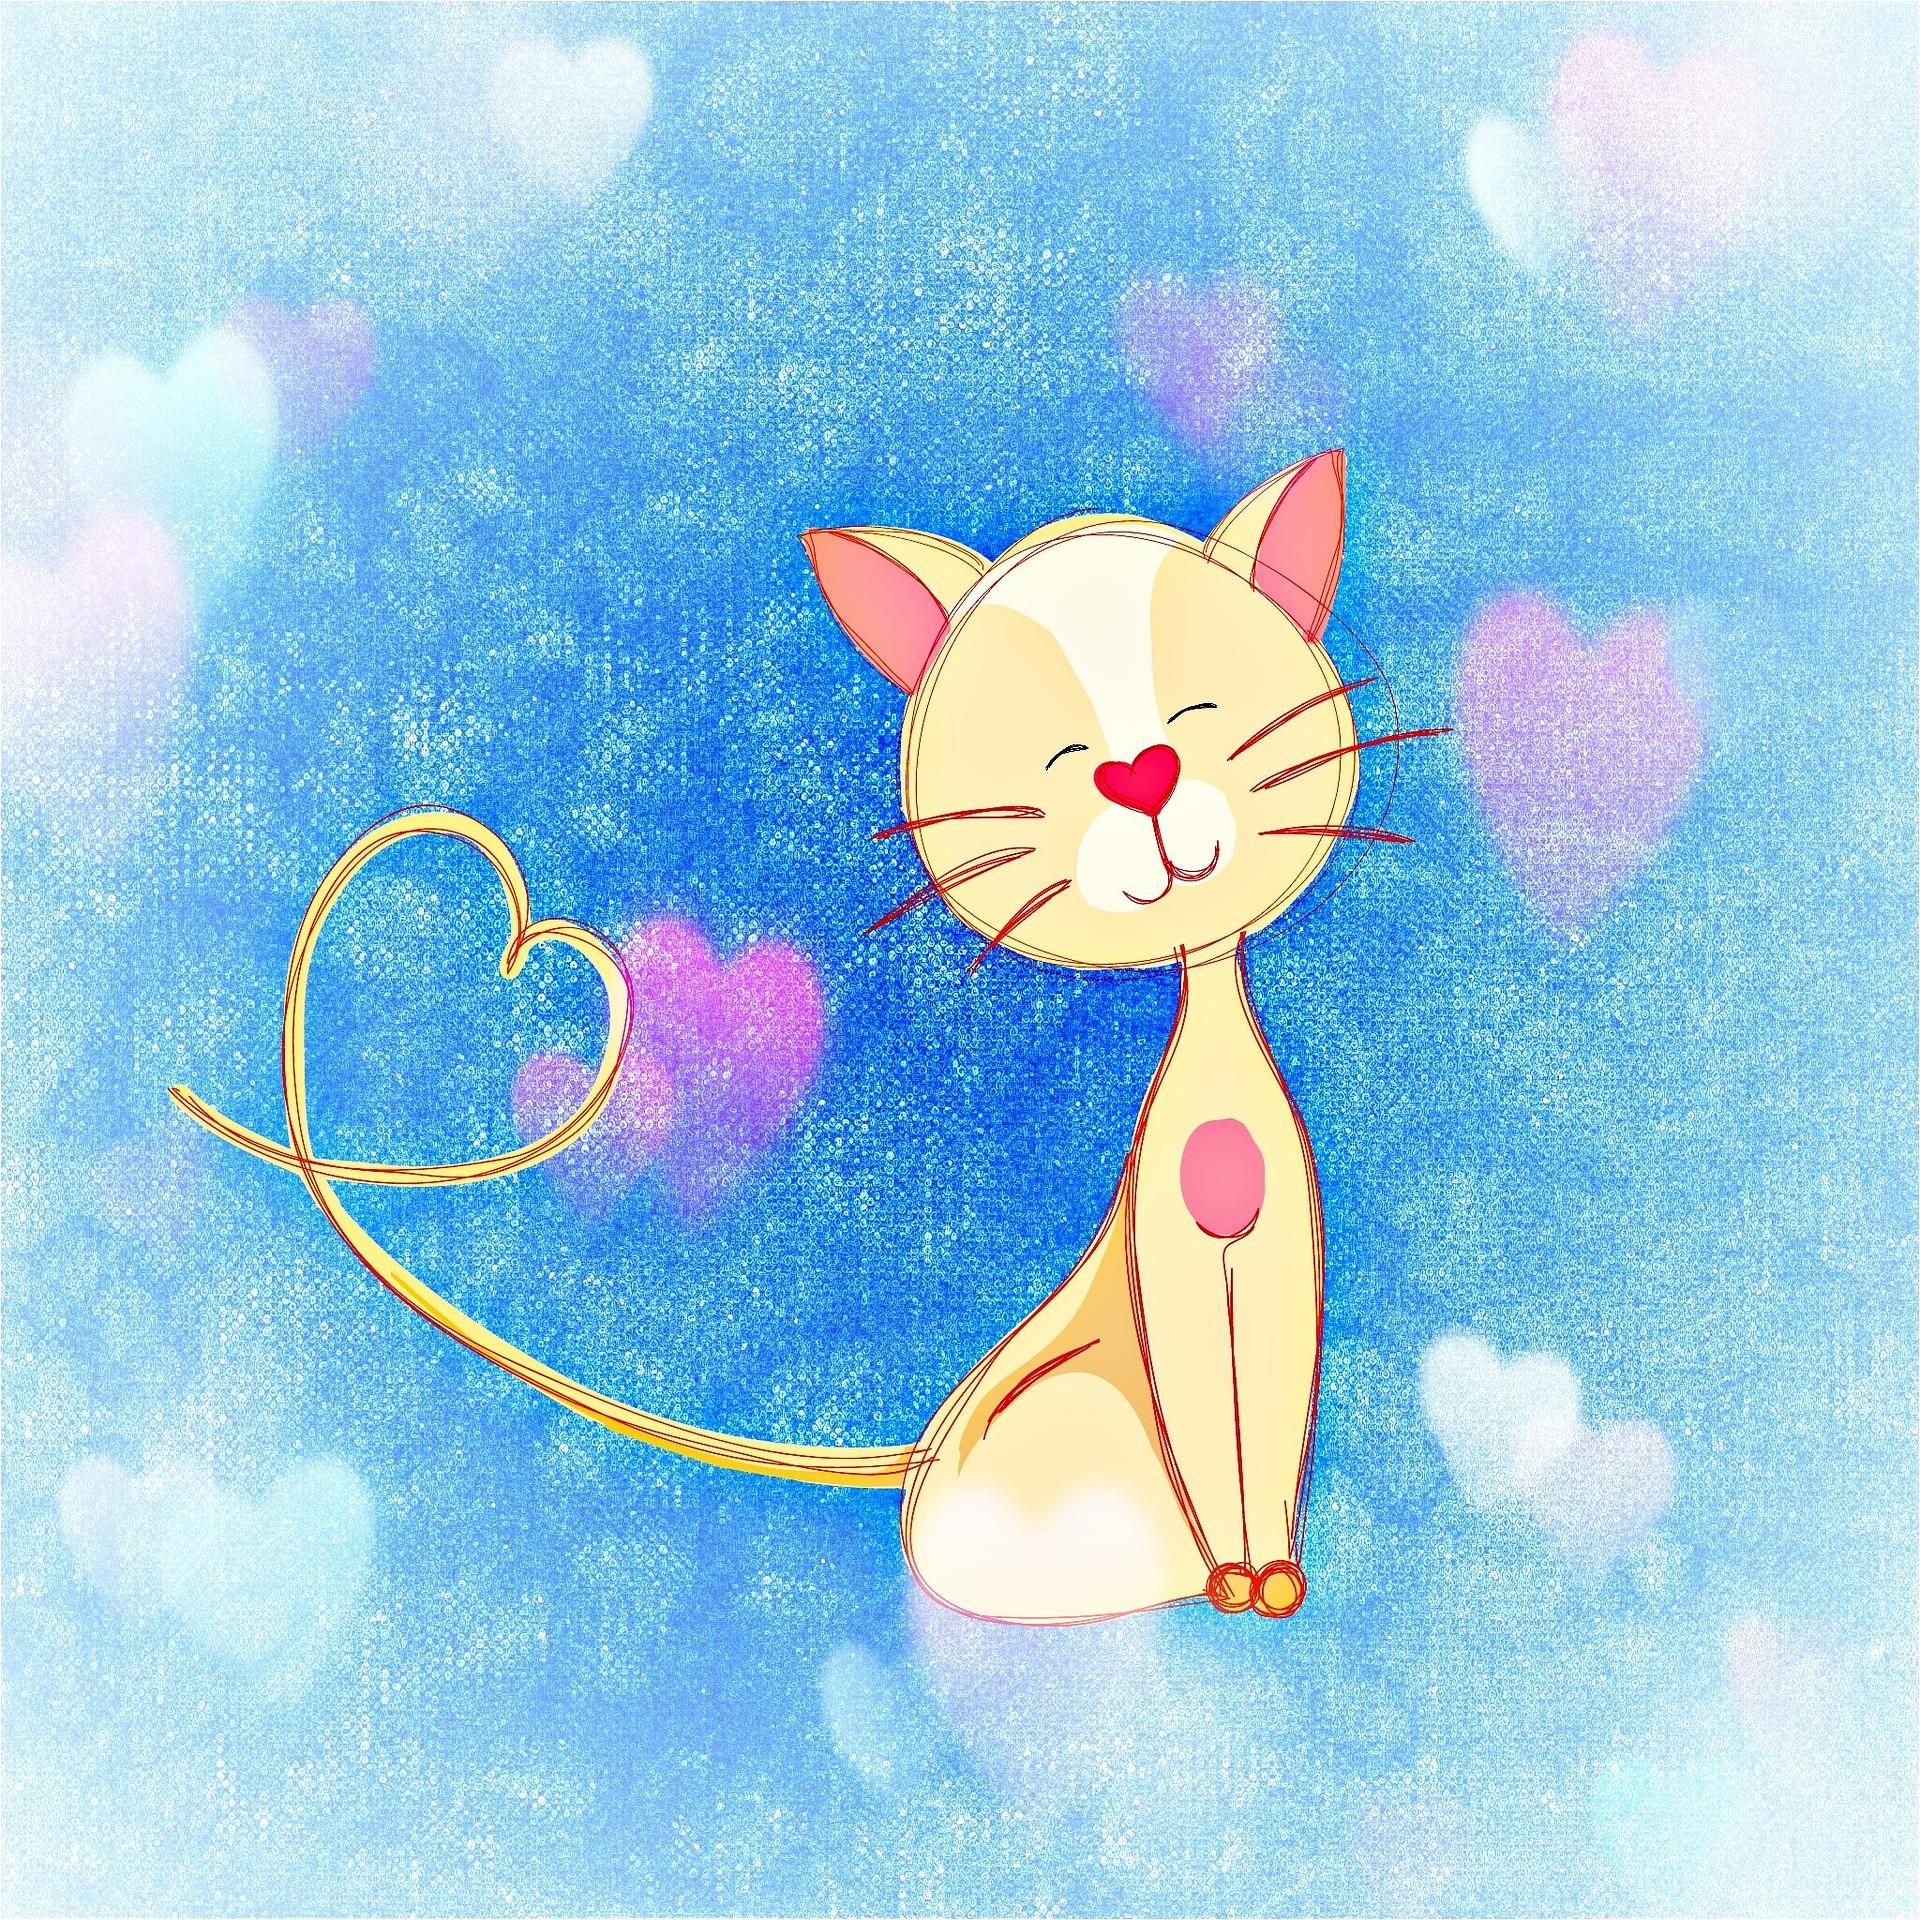 Katze mit Herzen